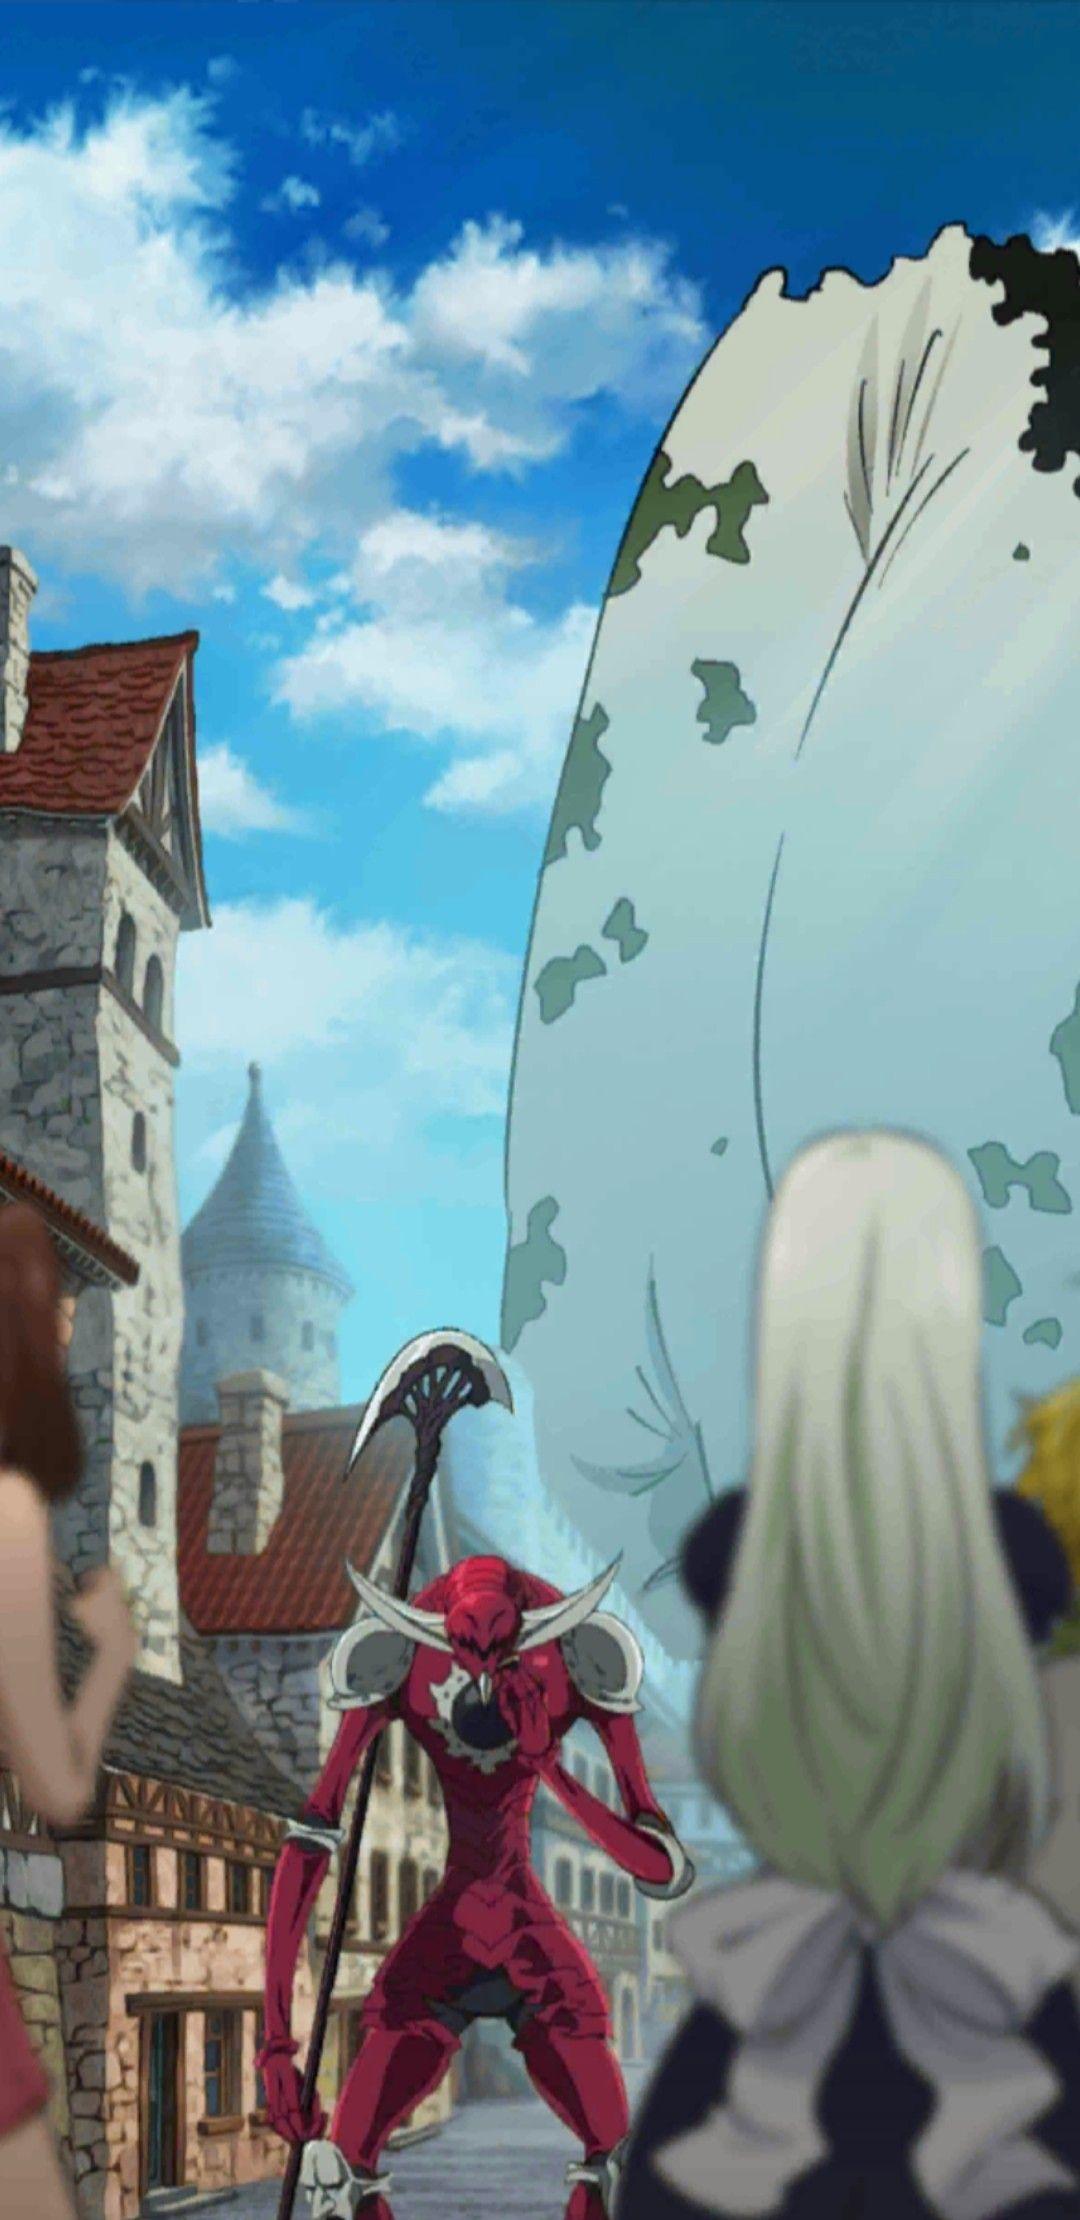 -   - #animeangel #animecosplay #animefanart #animefantasy #animehair #animenaruto #animeprofilepicture #btsanime #los7pecadoscapitalesanime